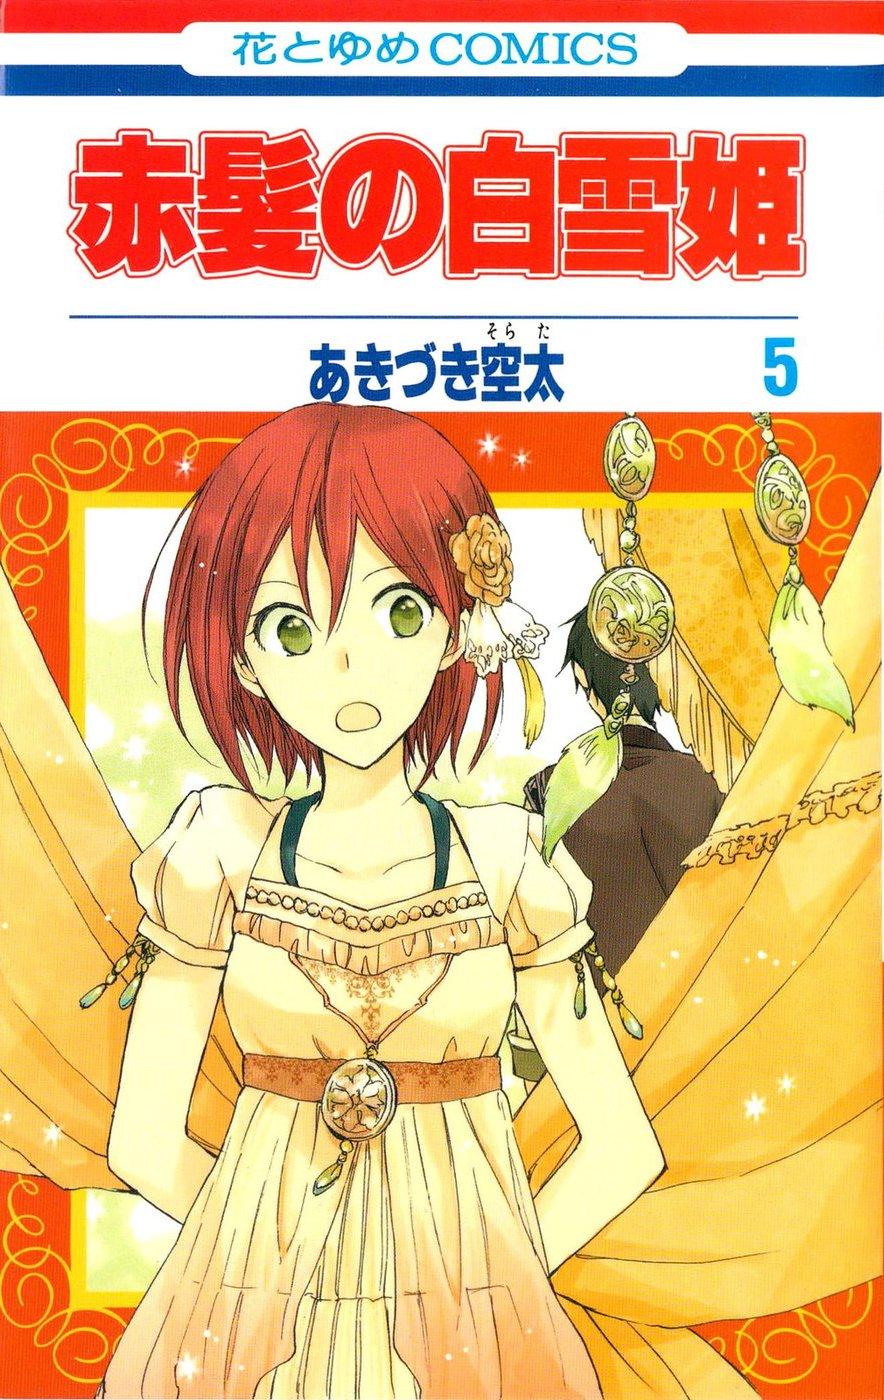 akagami_volume_5_cover_art